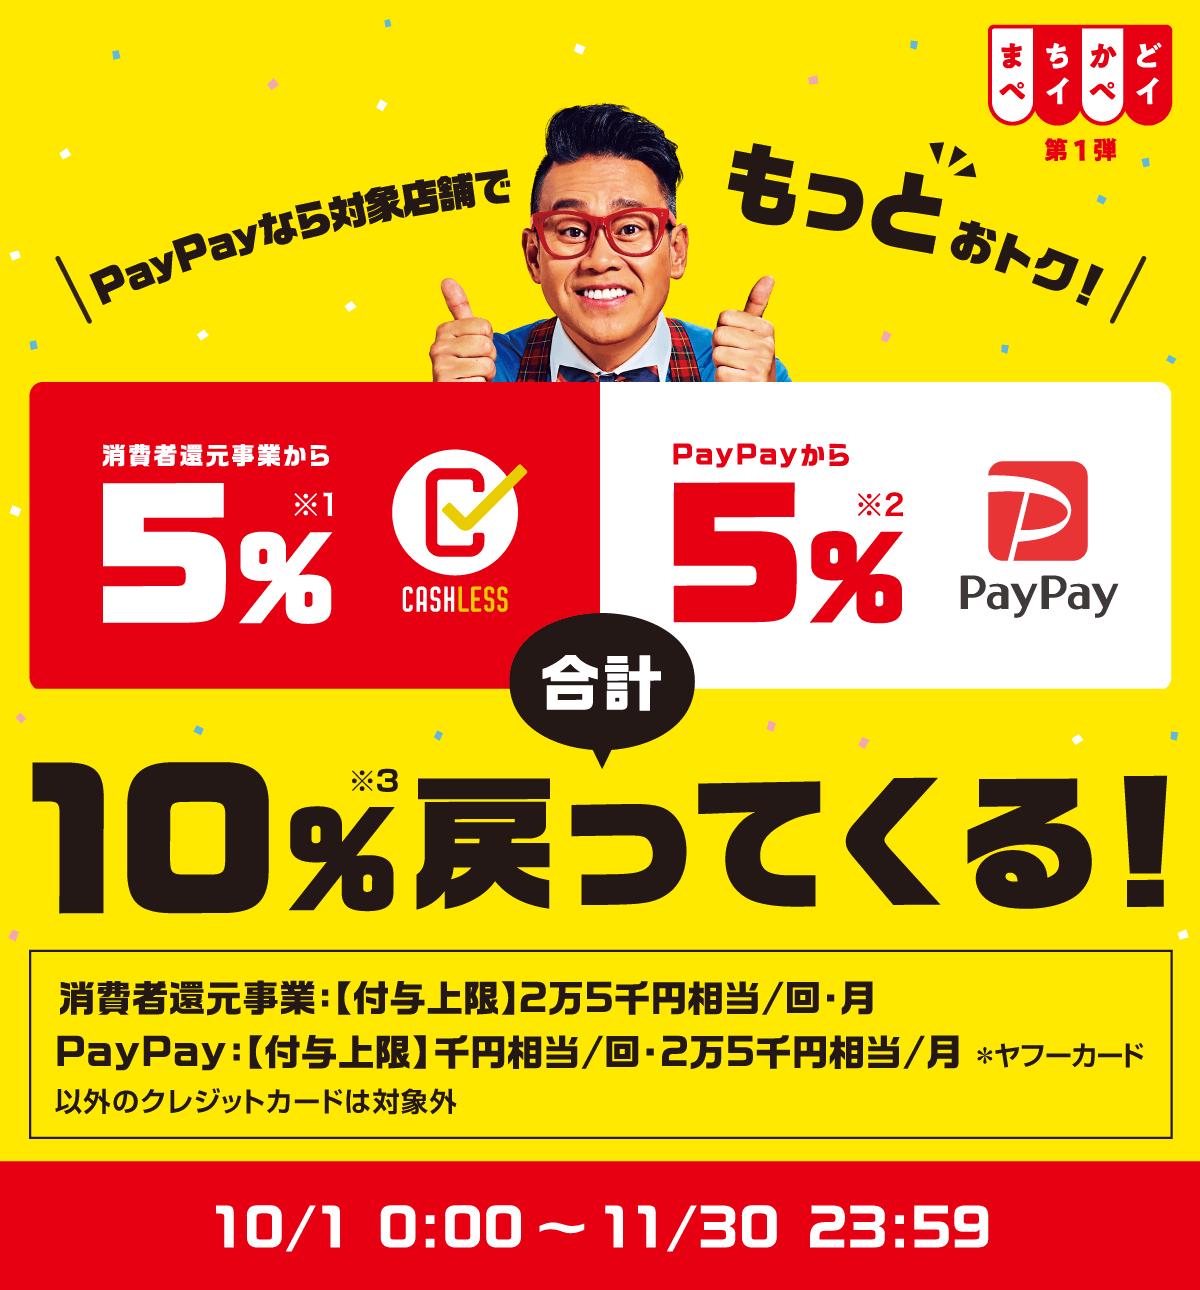 PayPayならもっとおトク! 消費者還元事業から5%※1 PayPayから最大5%※2 合計最大10%※3戻ってくる!